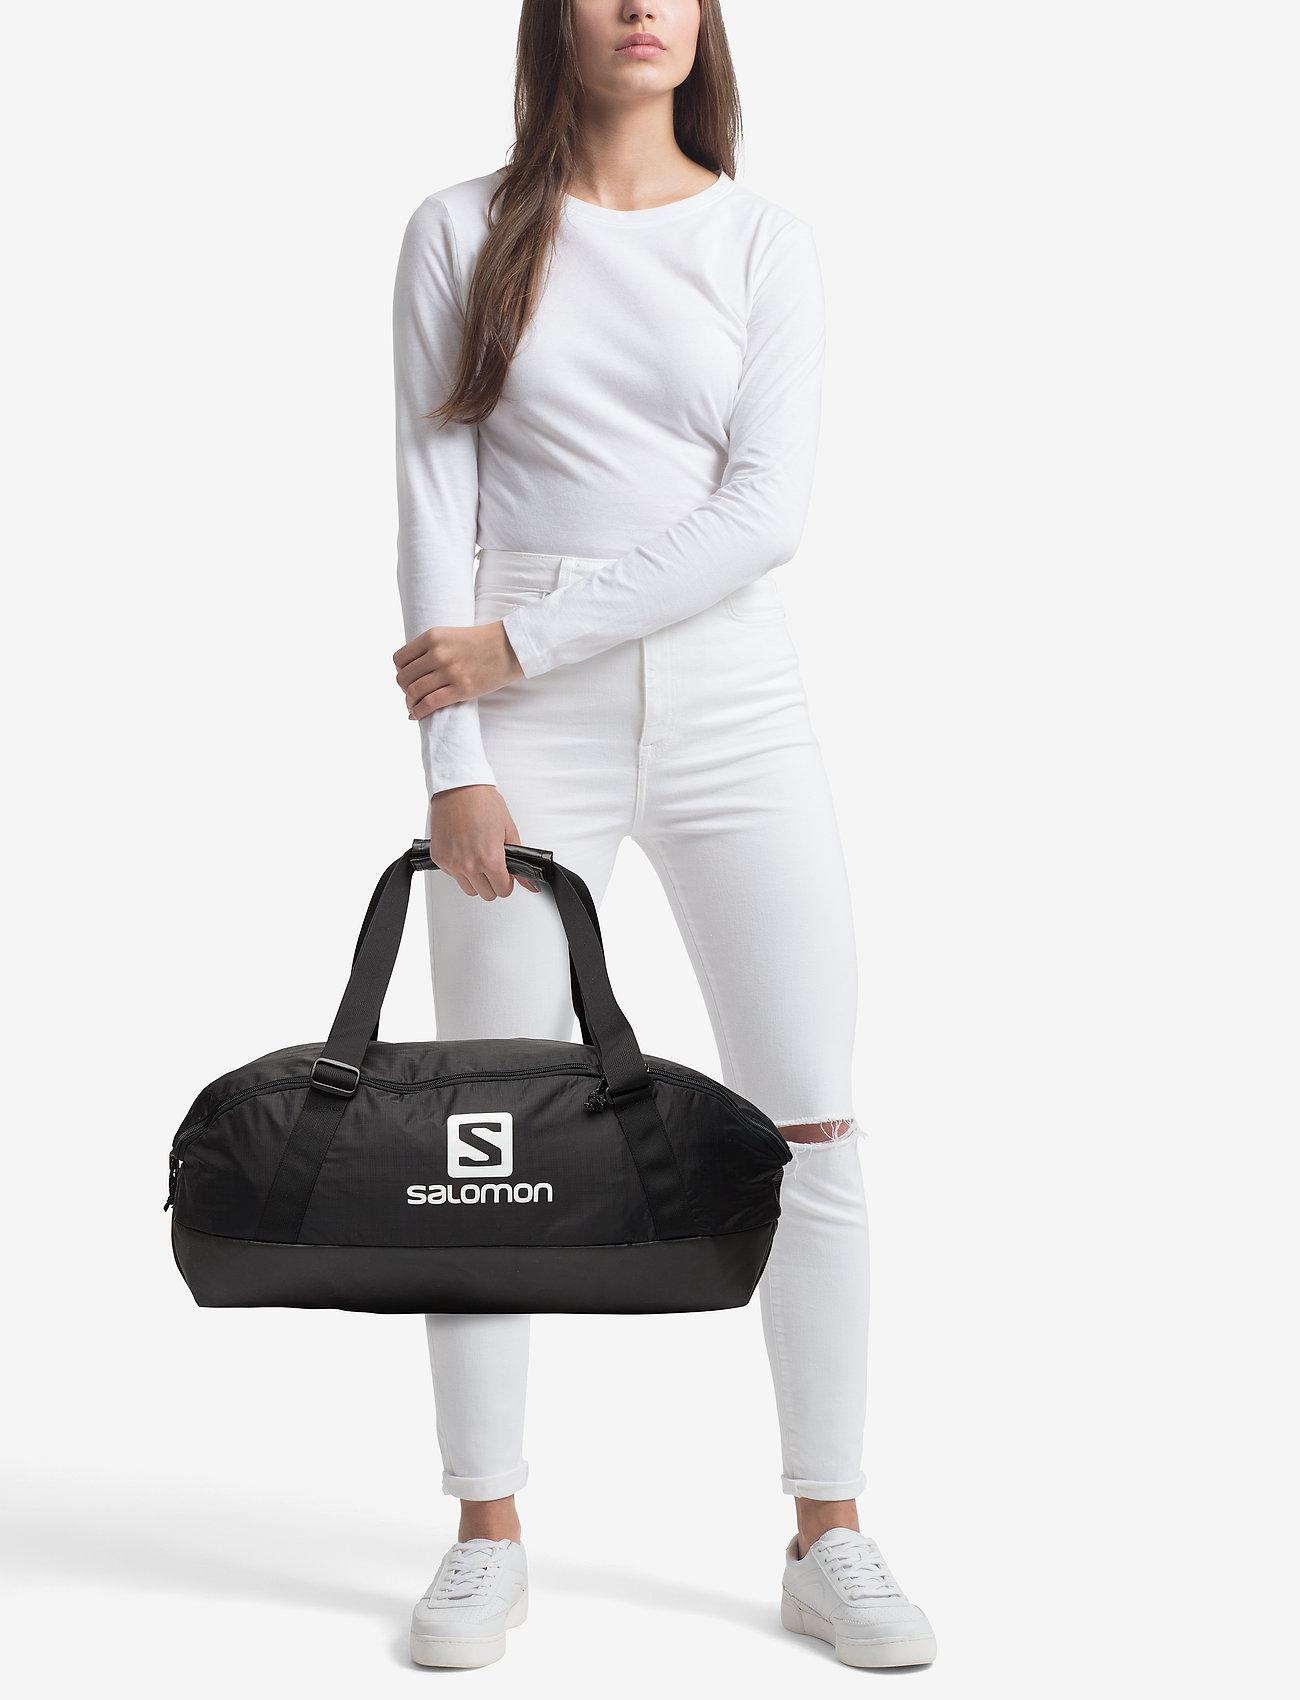 Salomon PROLOG 40 BAG - BLACK